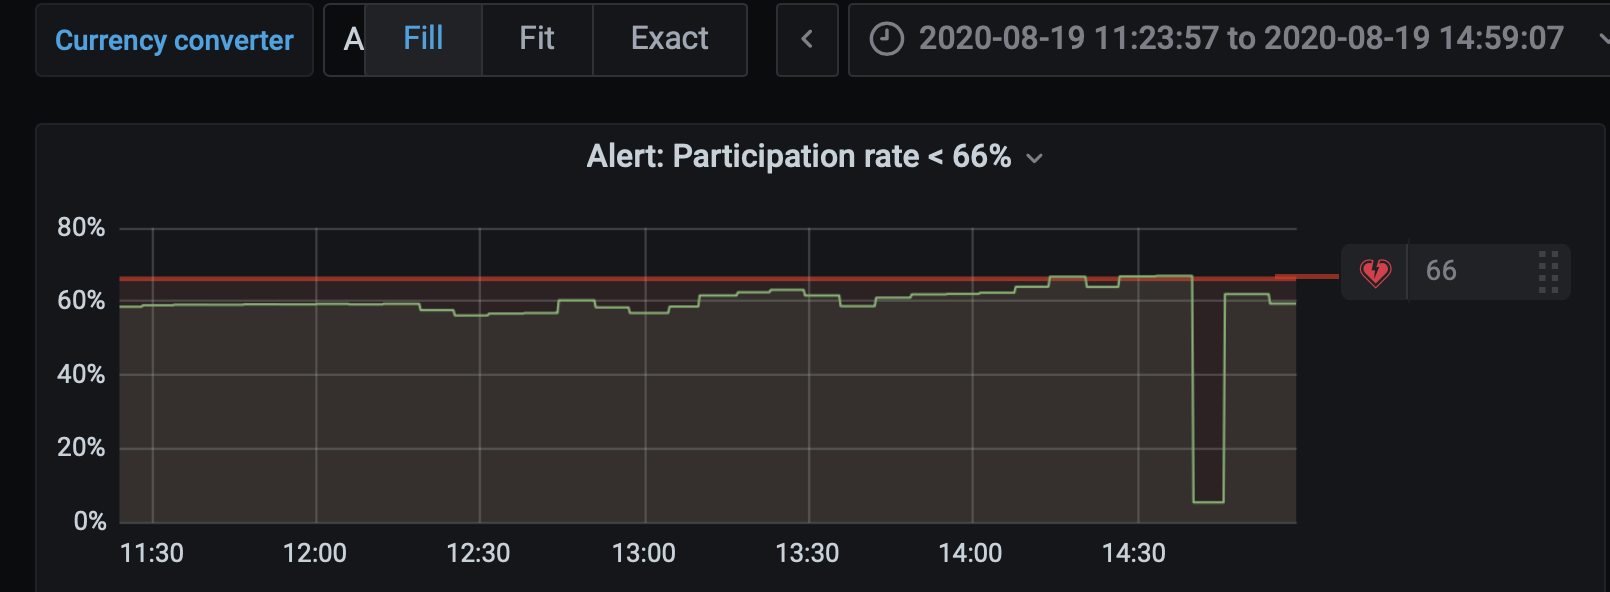 Ethereum 2.0 testnet participation after block finalized, Aug 2020